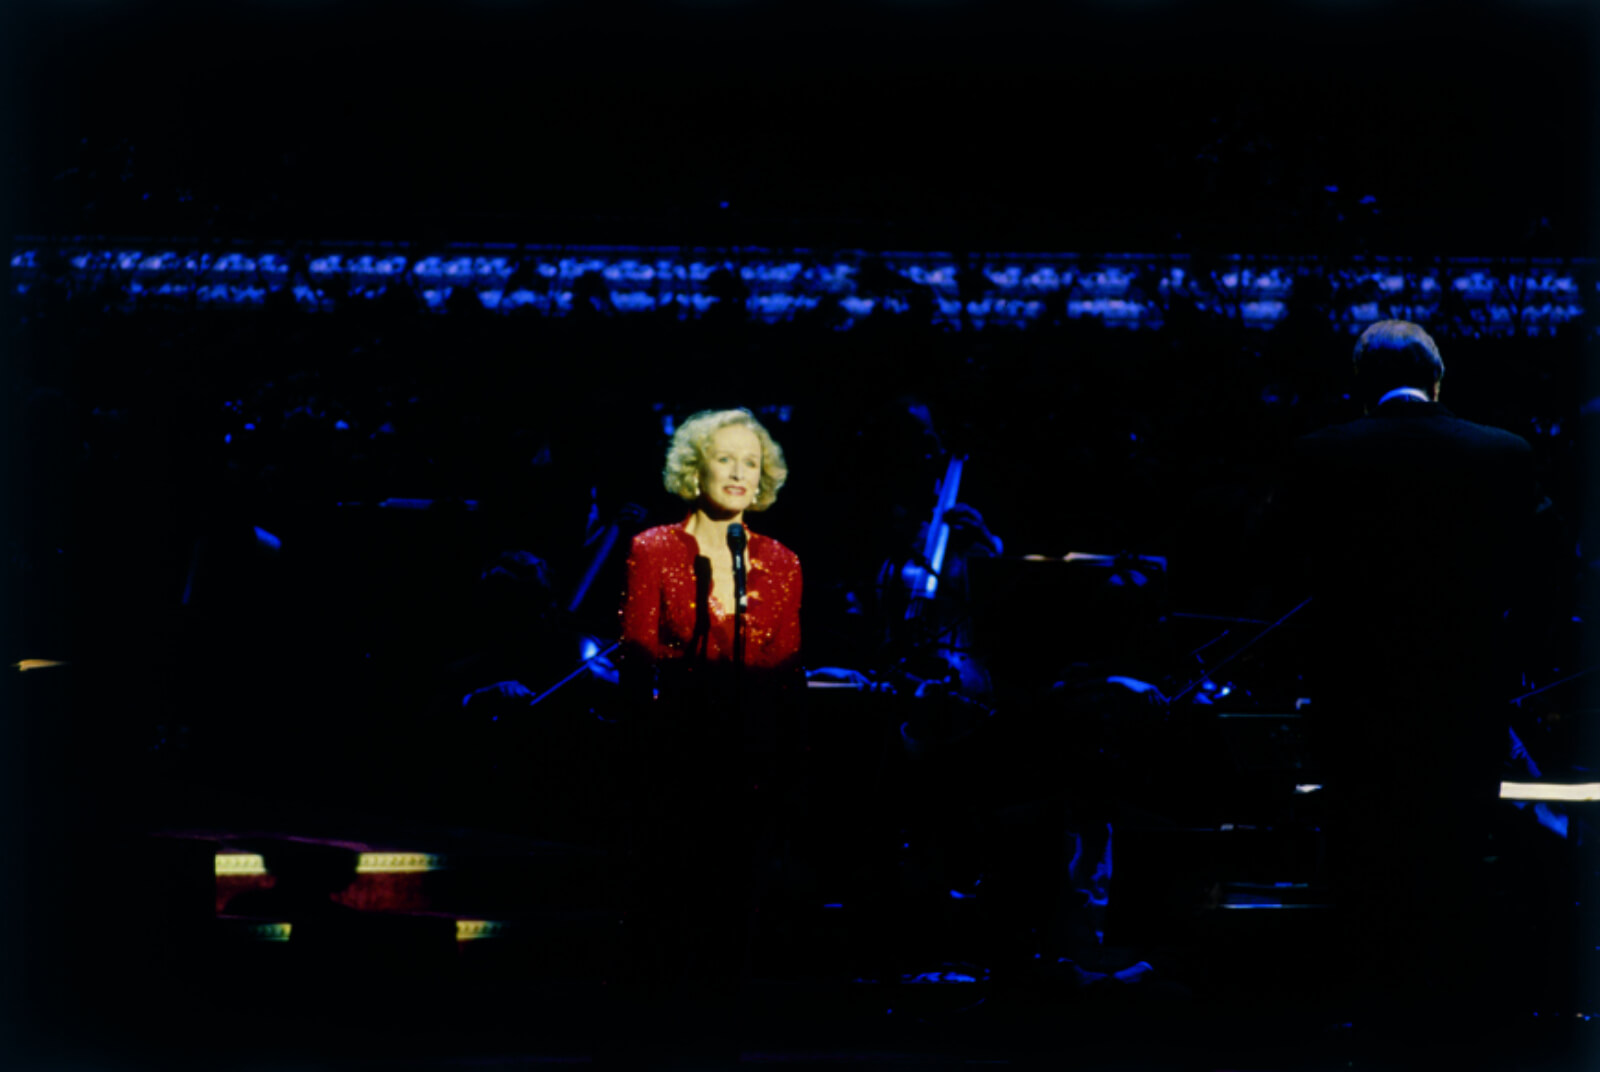 Glenn Close in a spotlight wearing red.